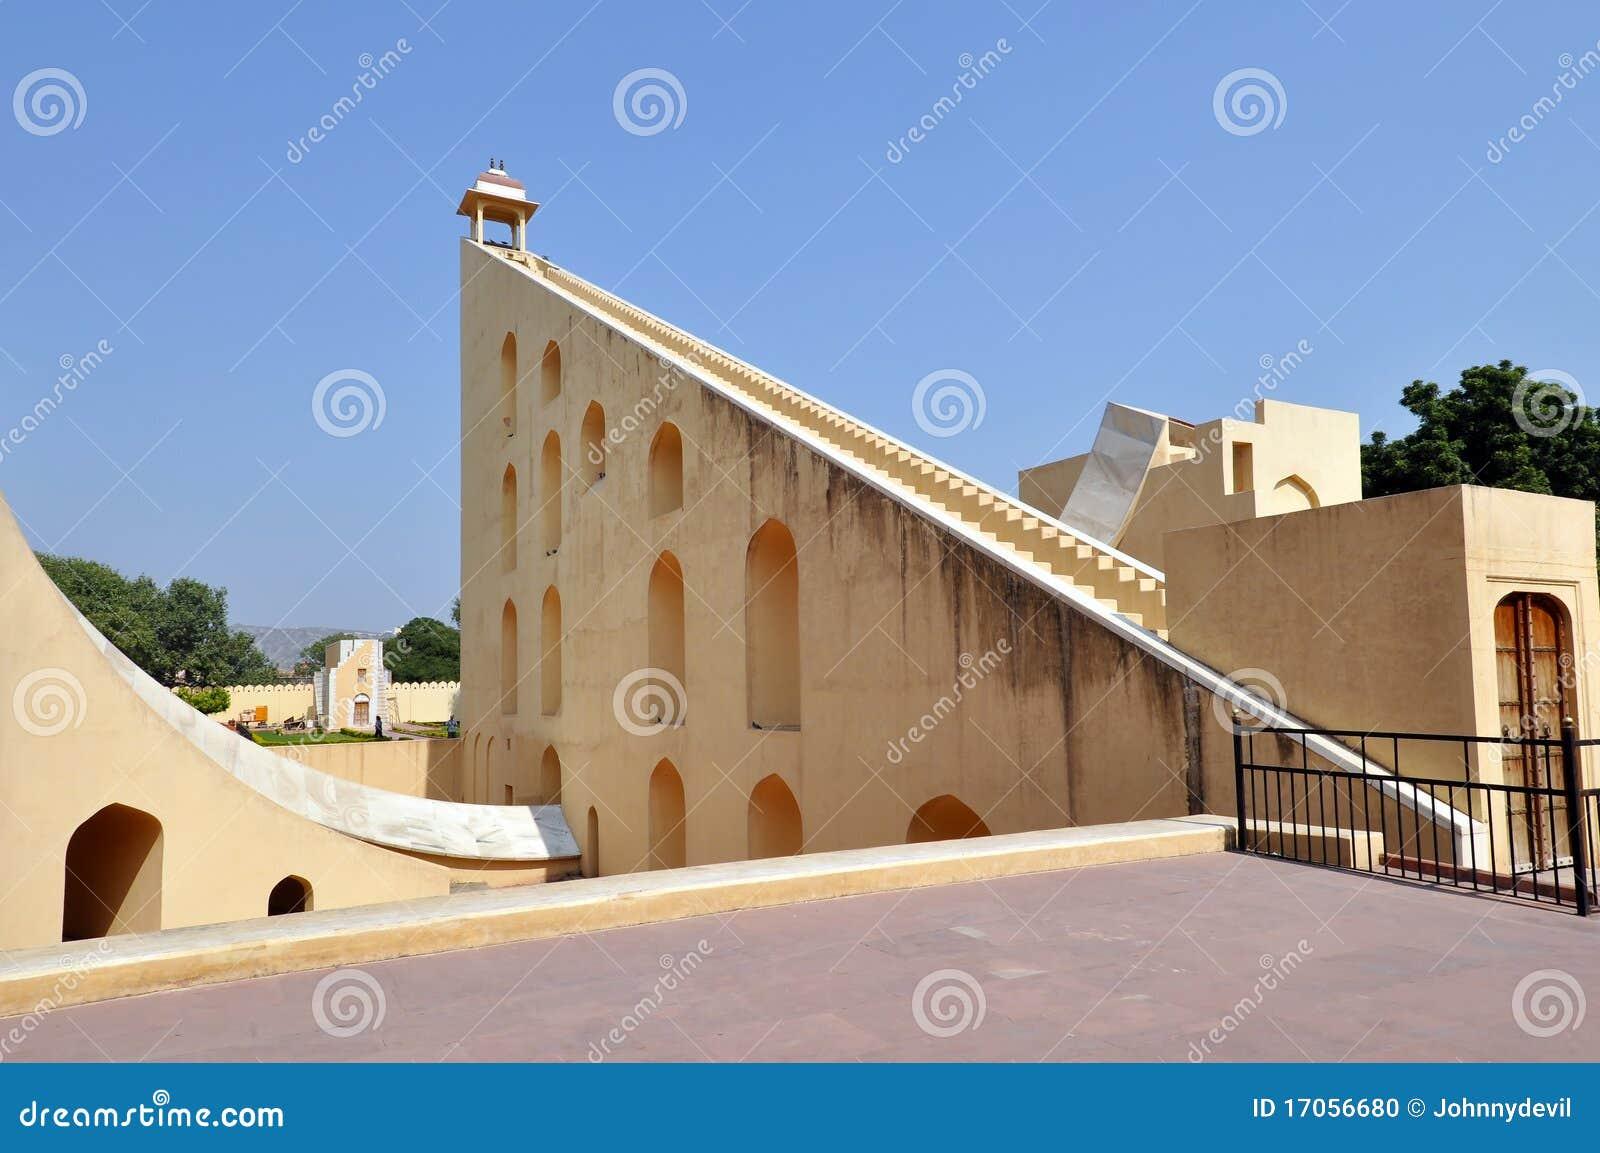 Jantar mantar παρατηρητήριο